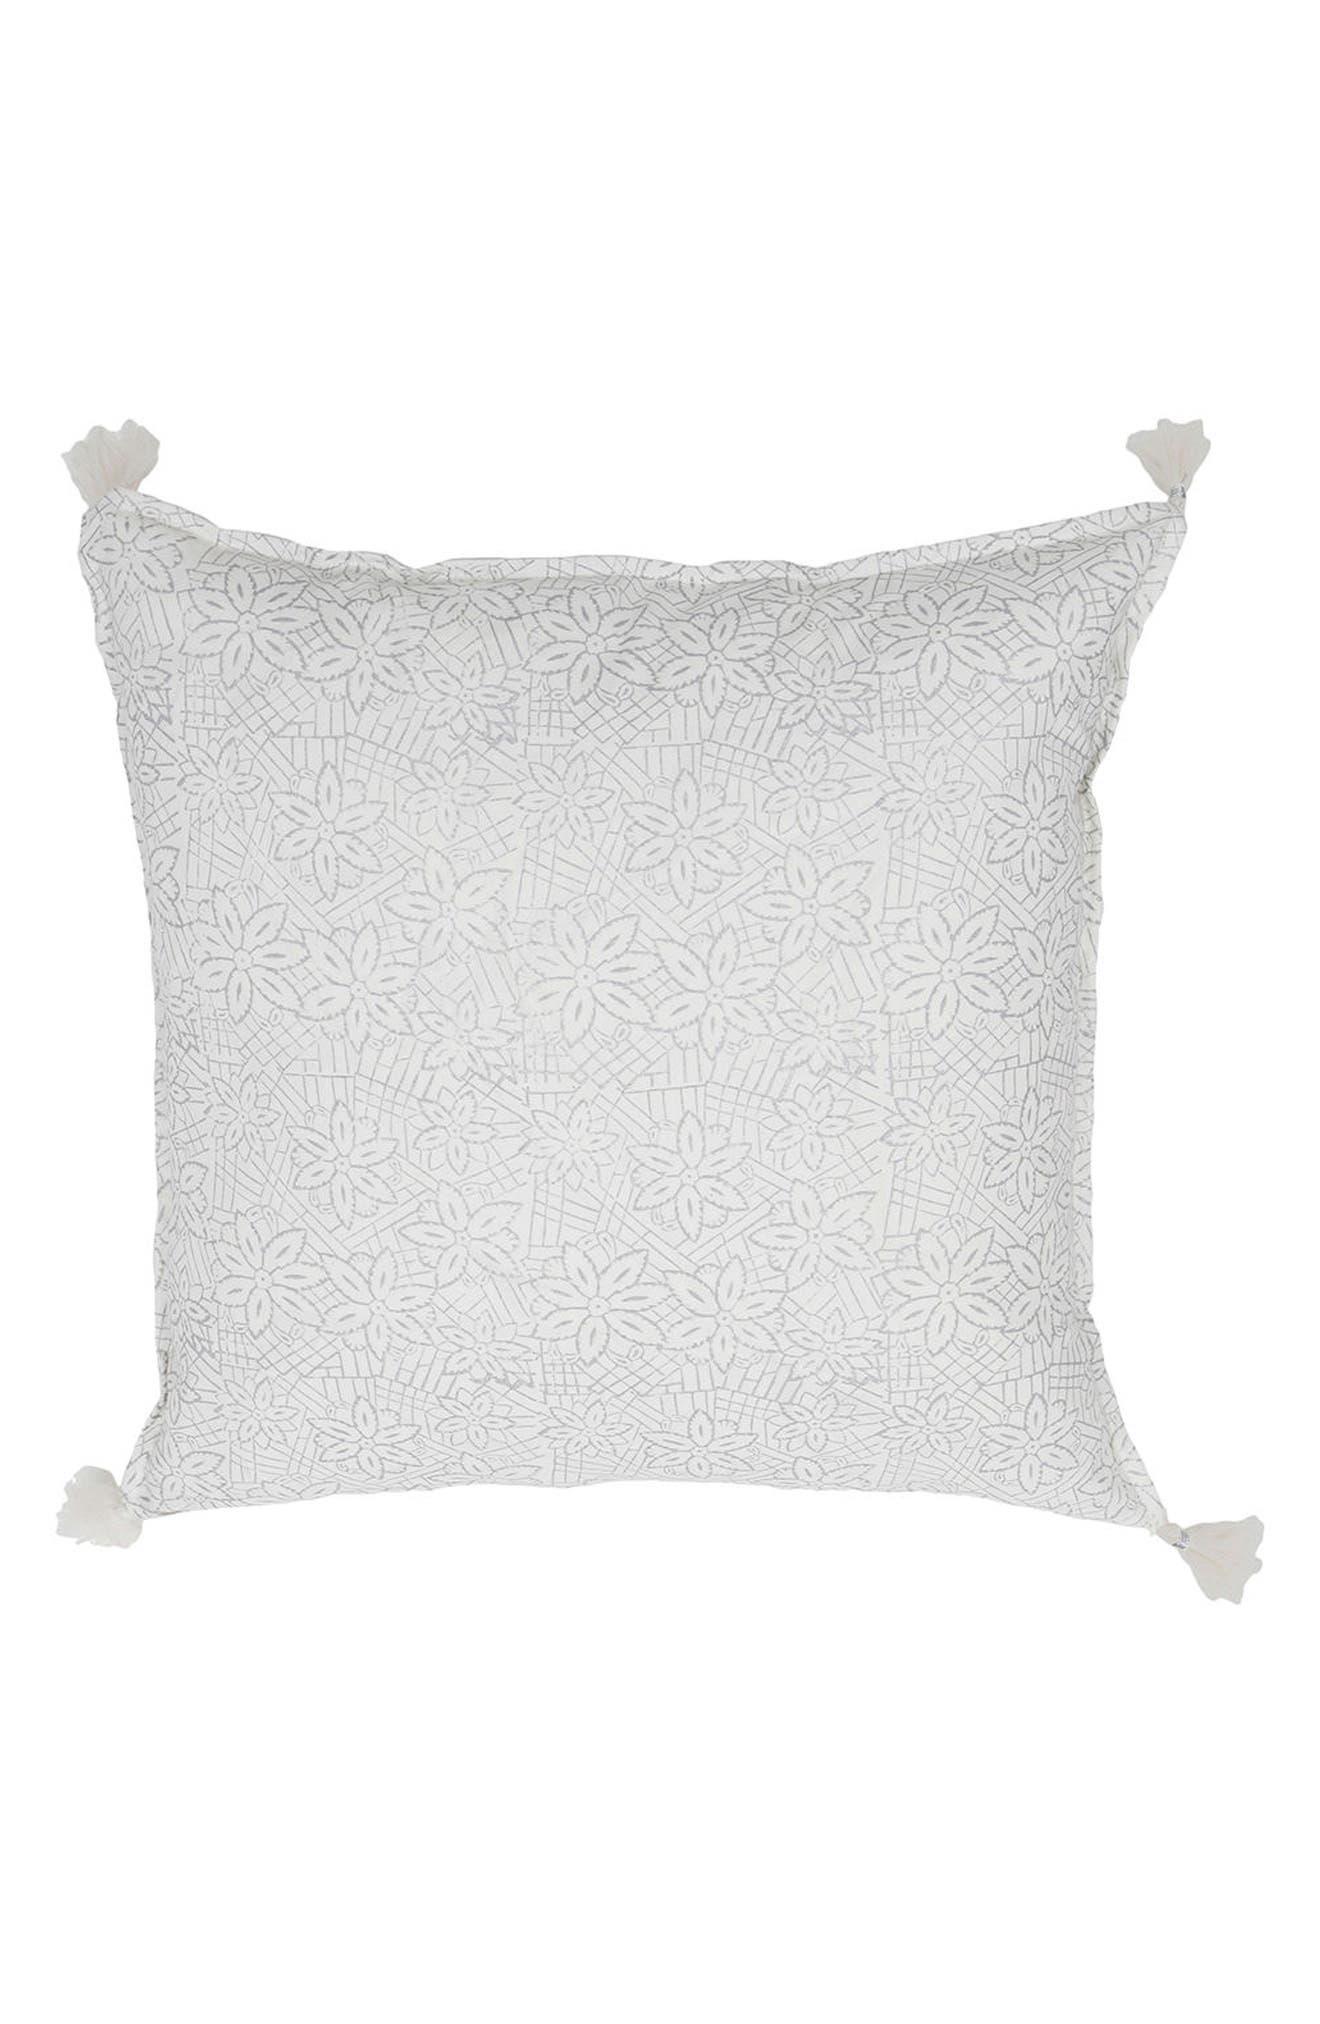 Keya Accent Pillow,                             Main thumbnail 1, color,                             SILVER